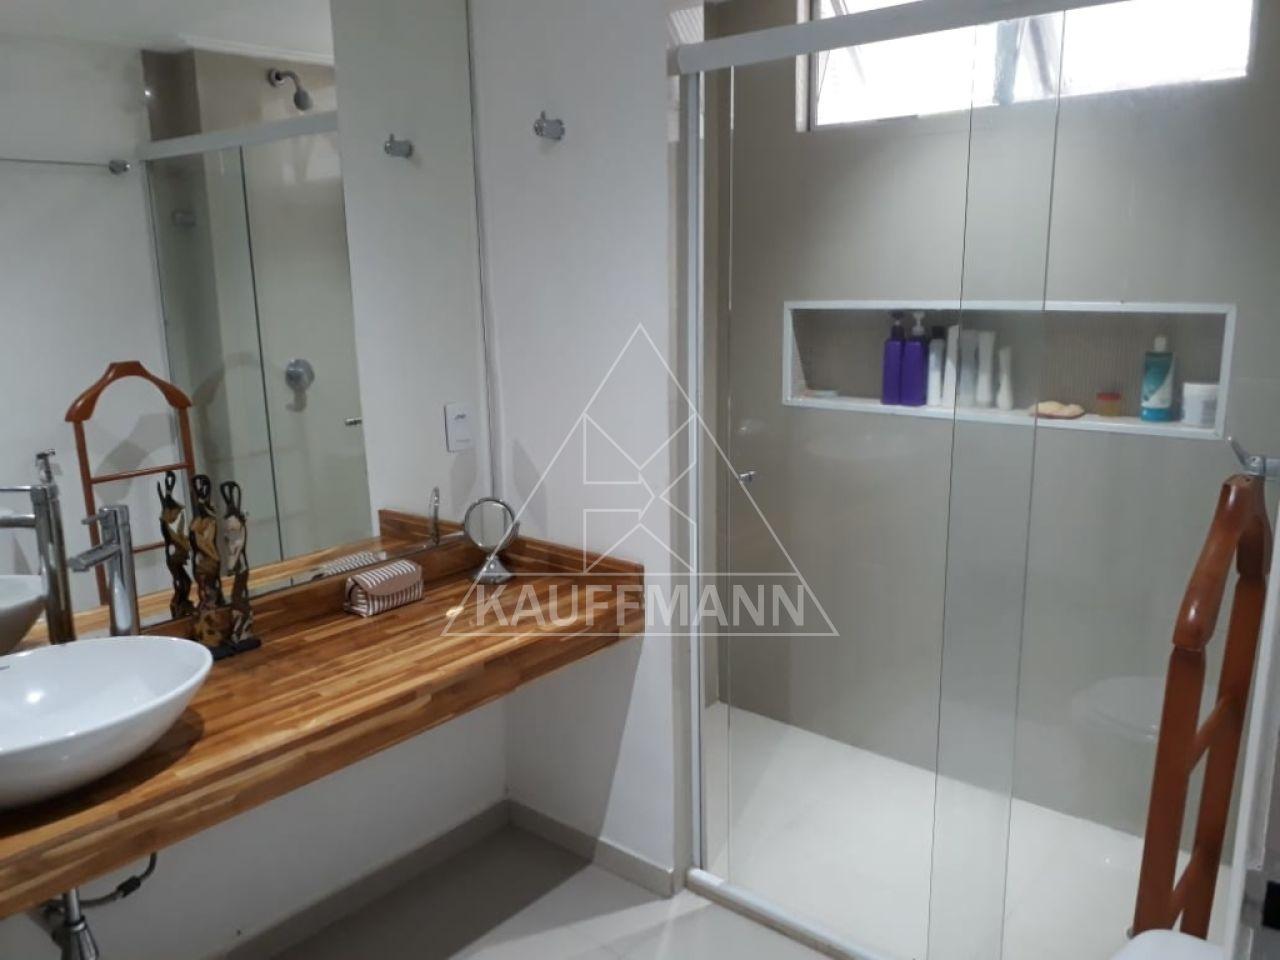 apartamento-venda-sao-paulo-jardim-paulista-3dormitorios-3suites-1vaga-174m2-Foto38